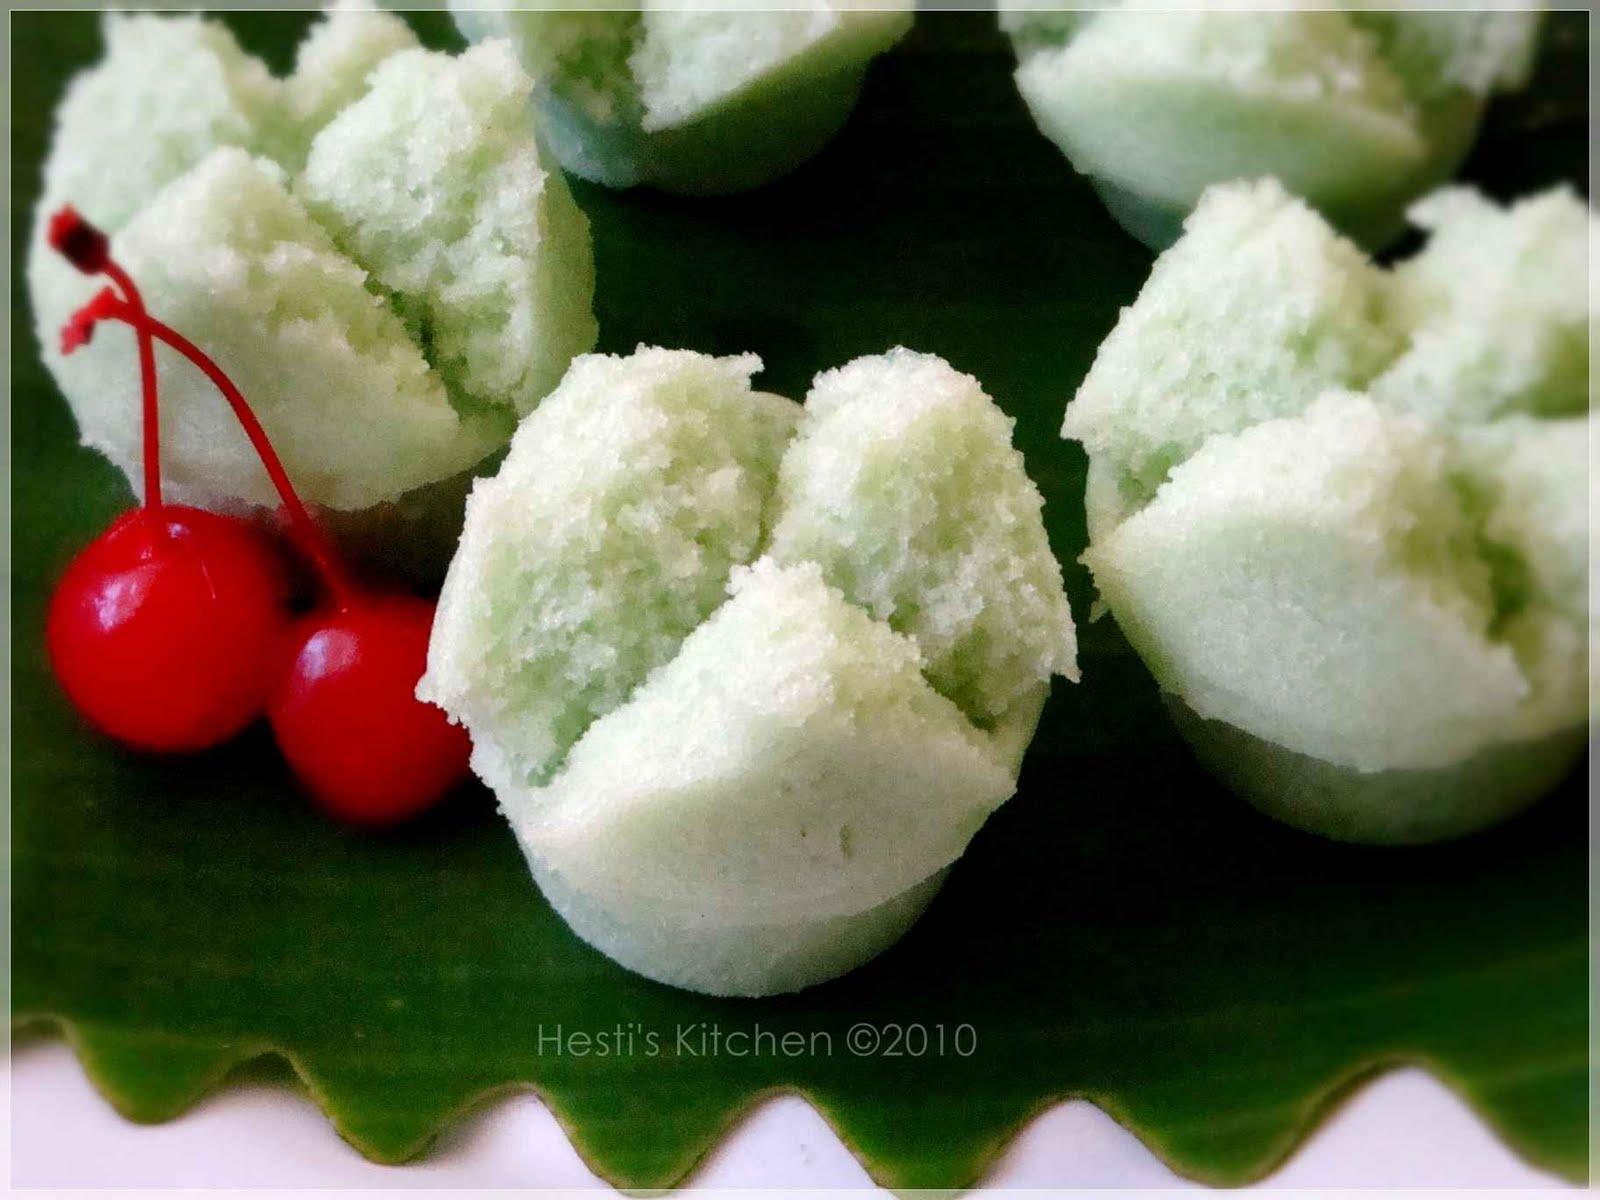 Resep Kue Ketan Cake Ideas and Designs